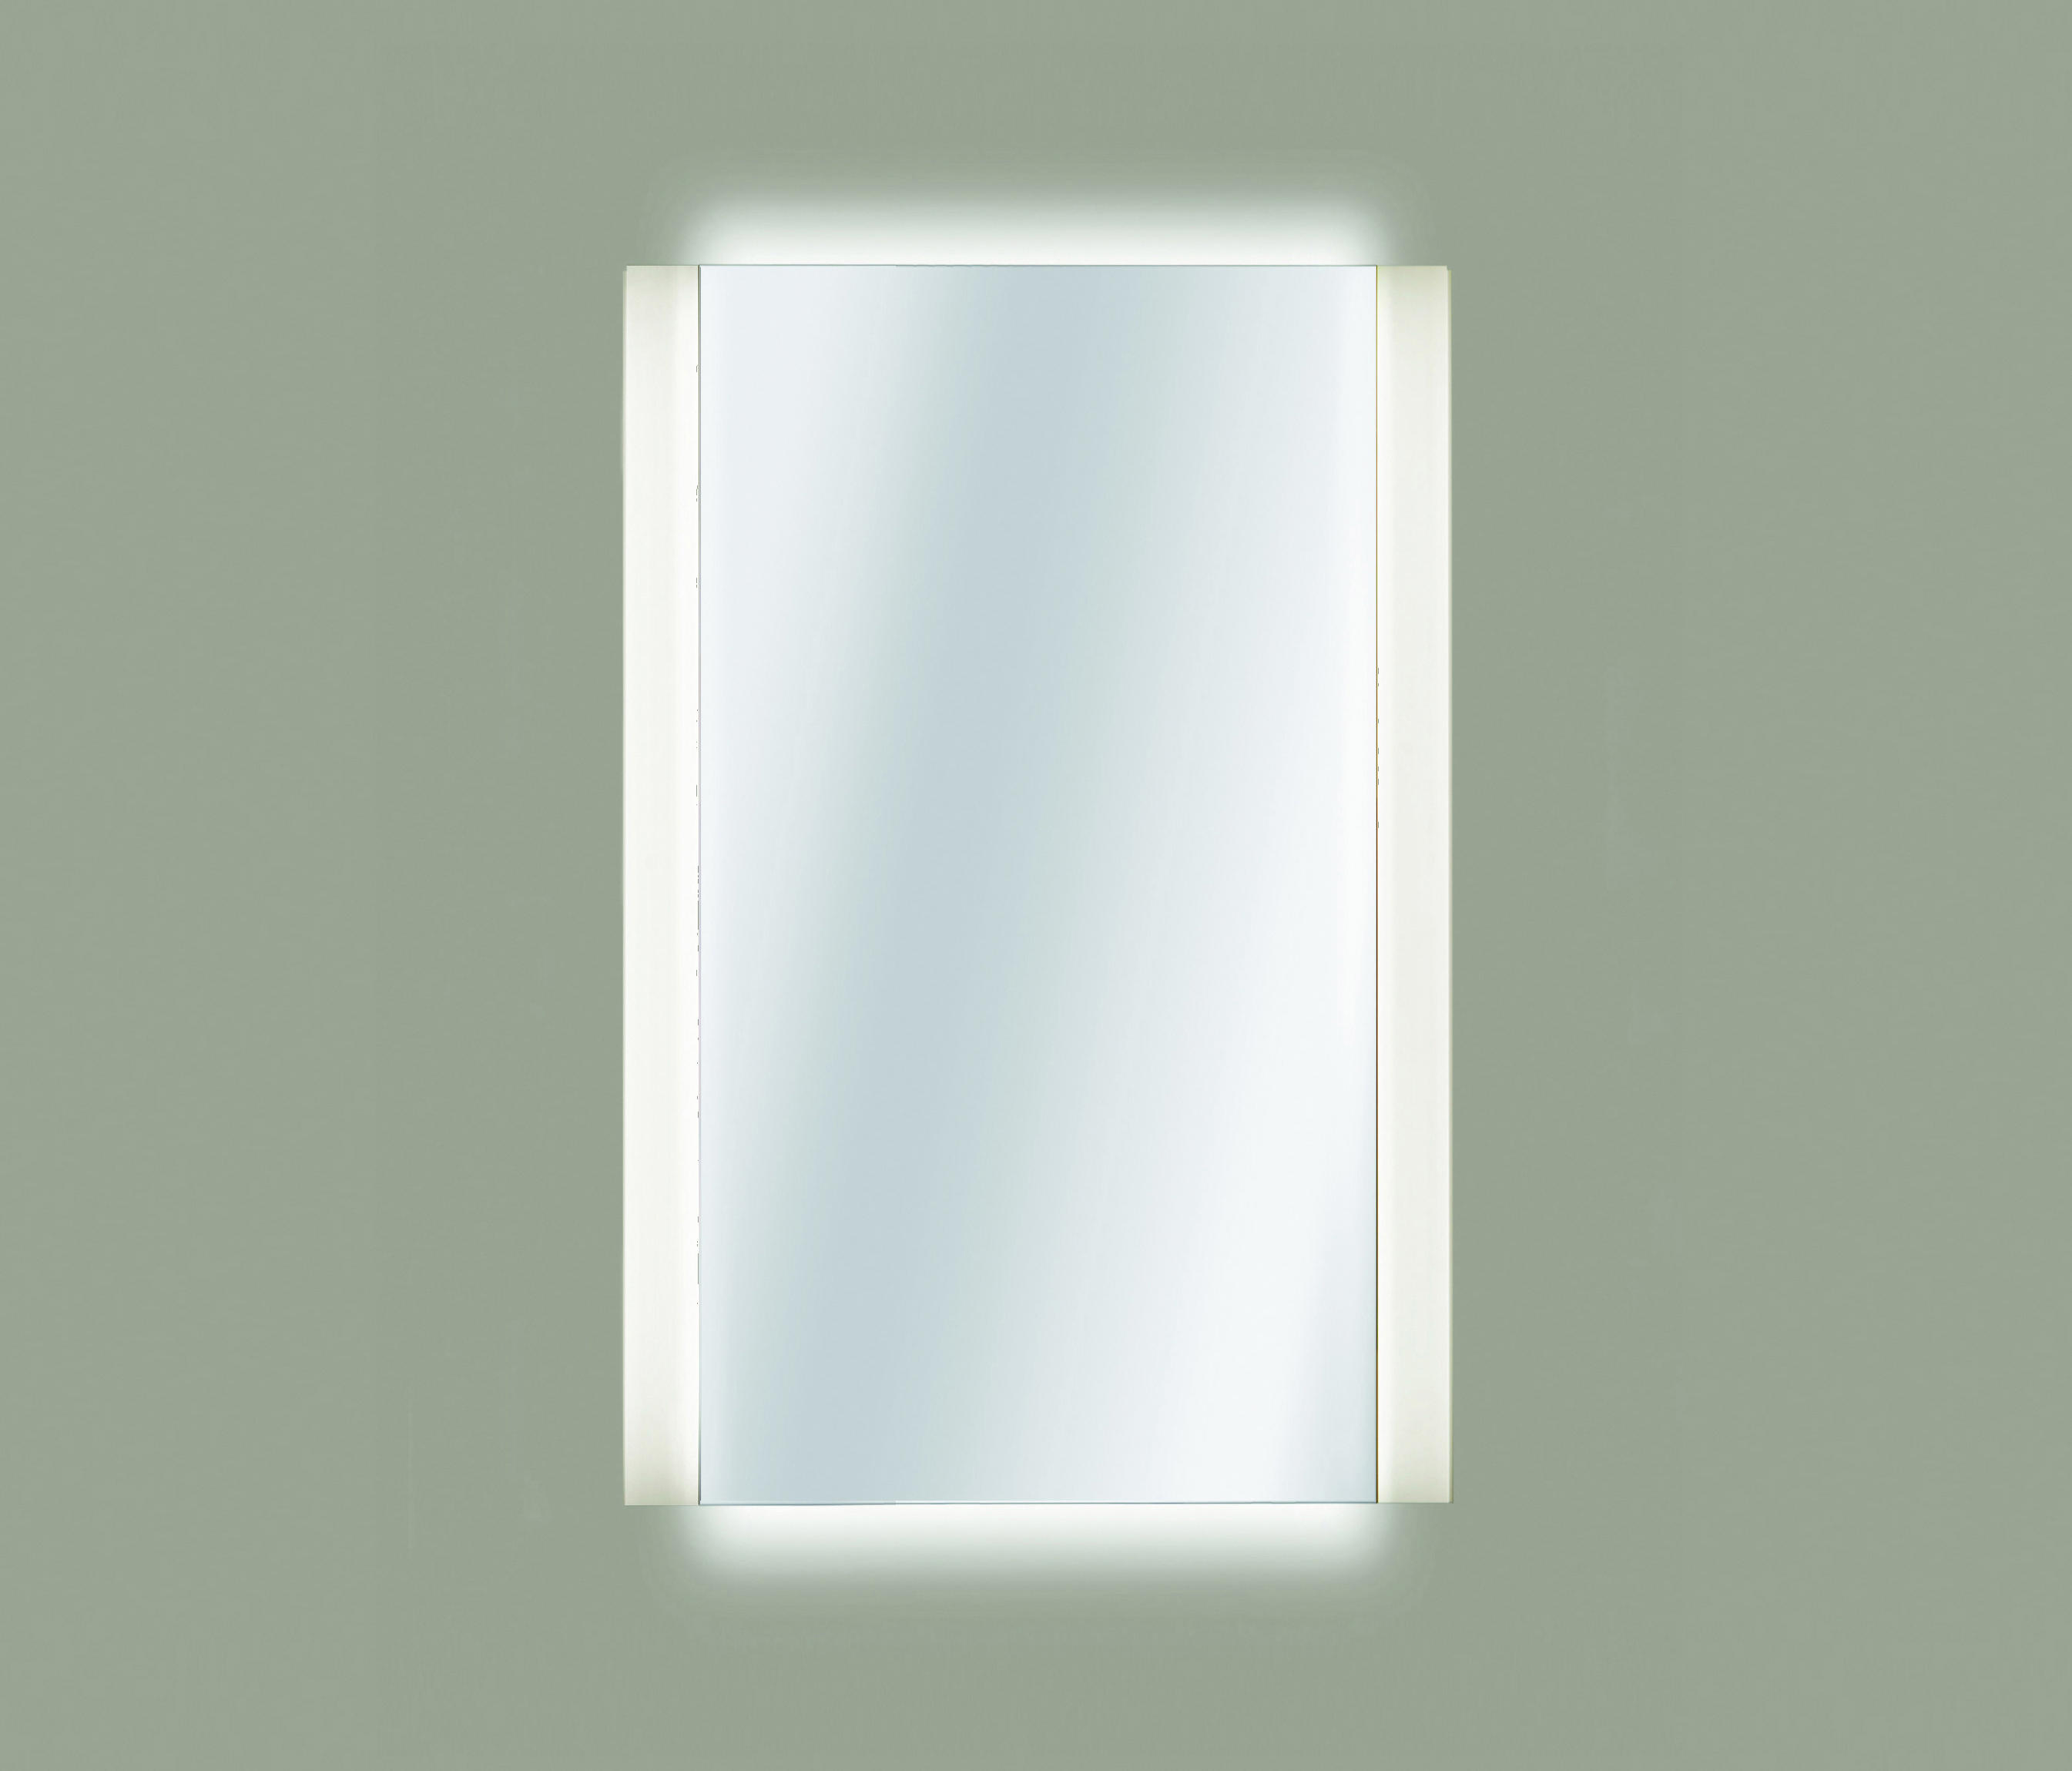 Espejo 980 x 1200 mm espejos de pared de armani roca for Distribuidor roca barcelona